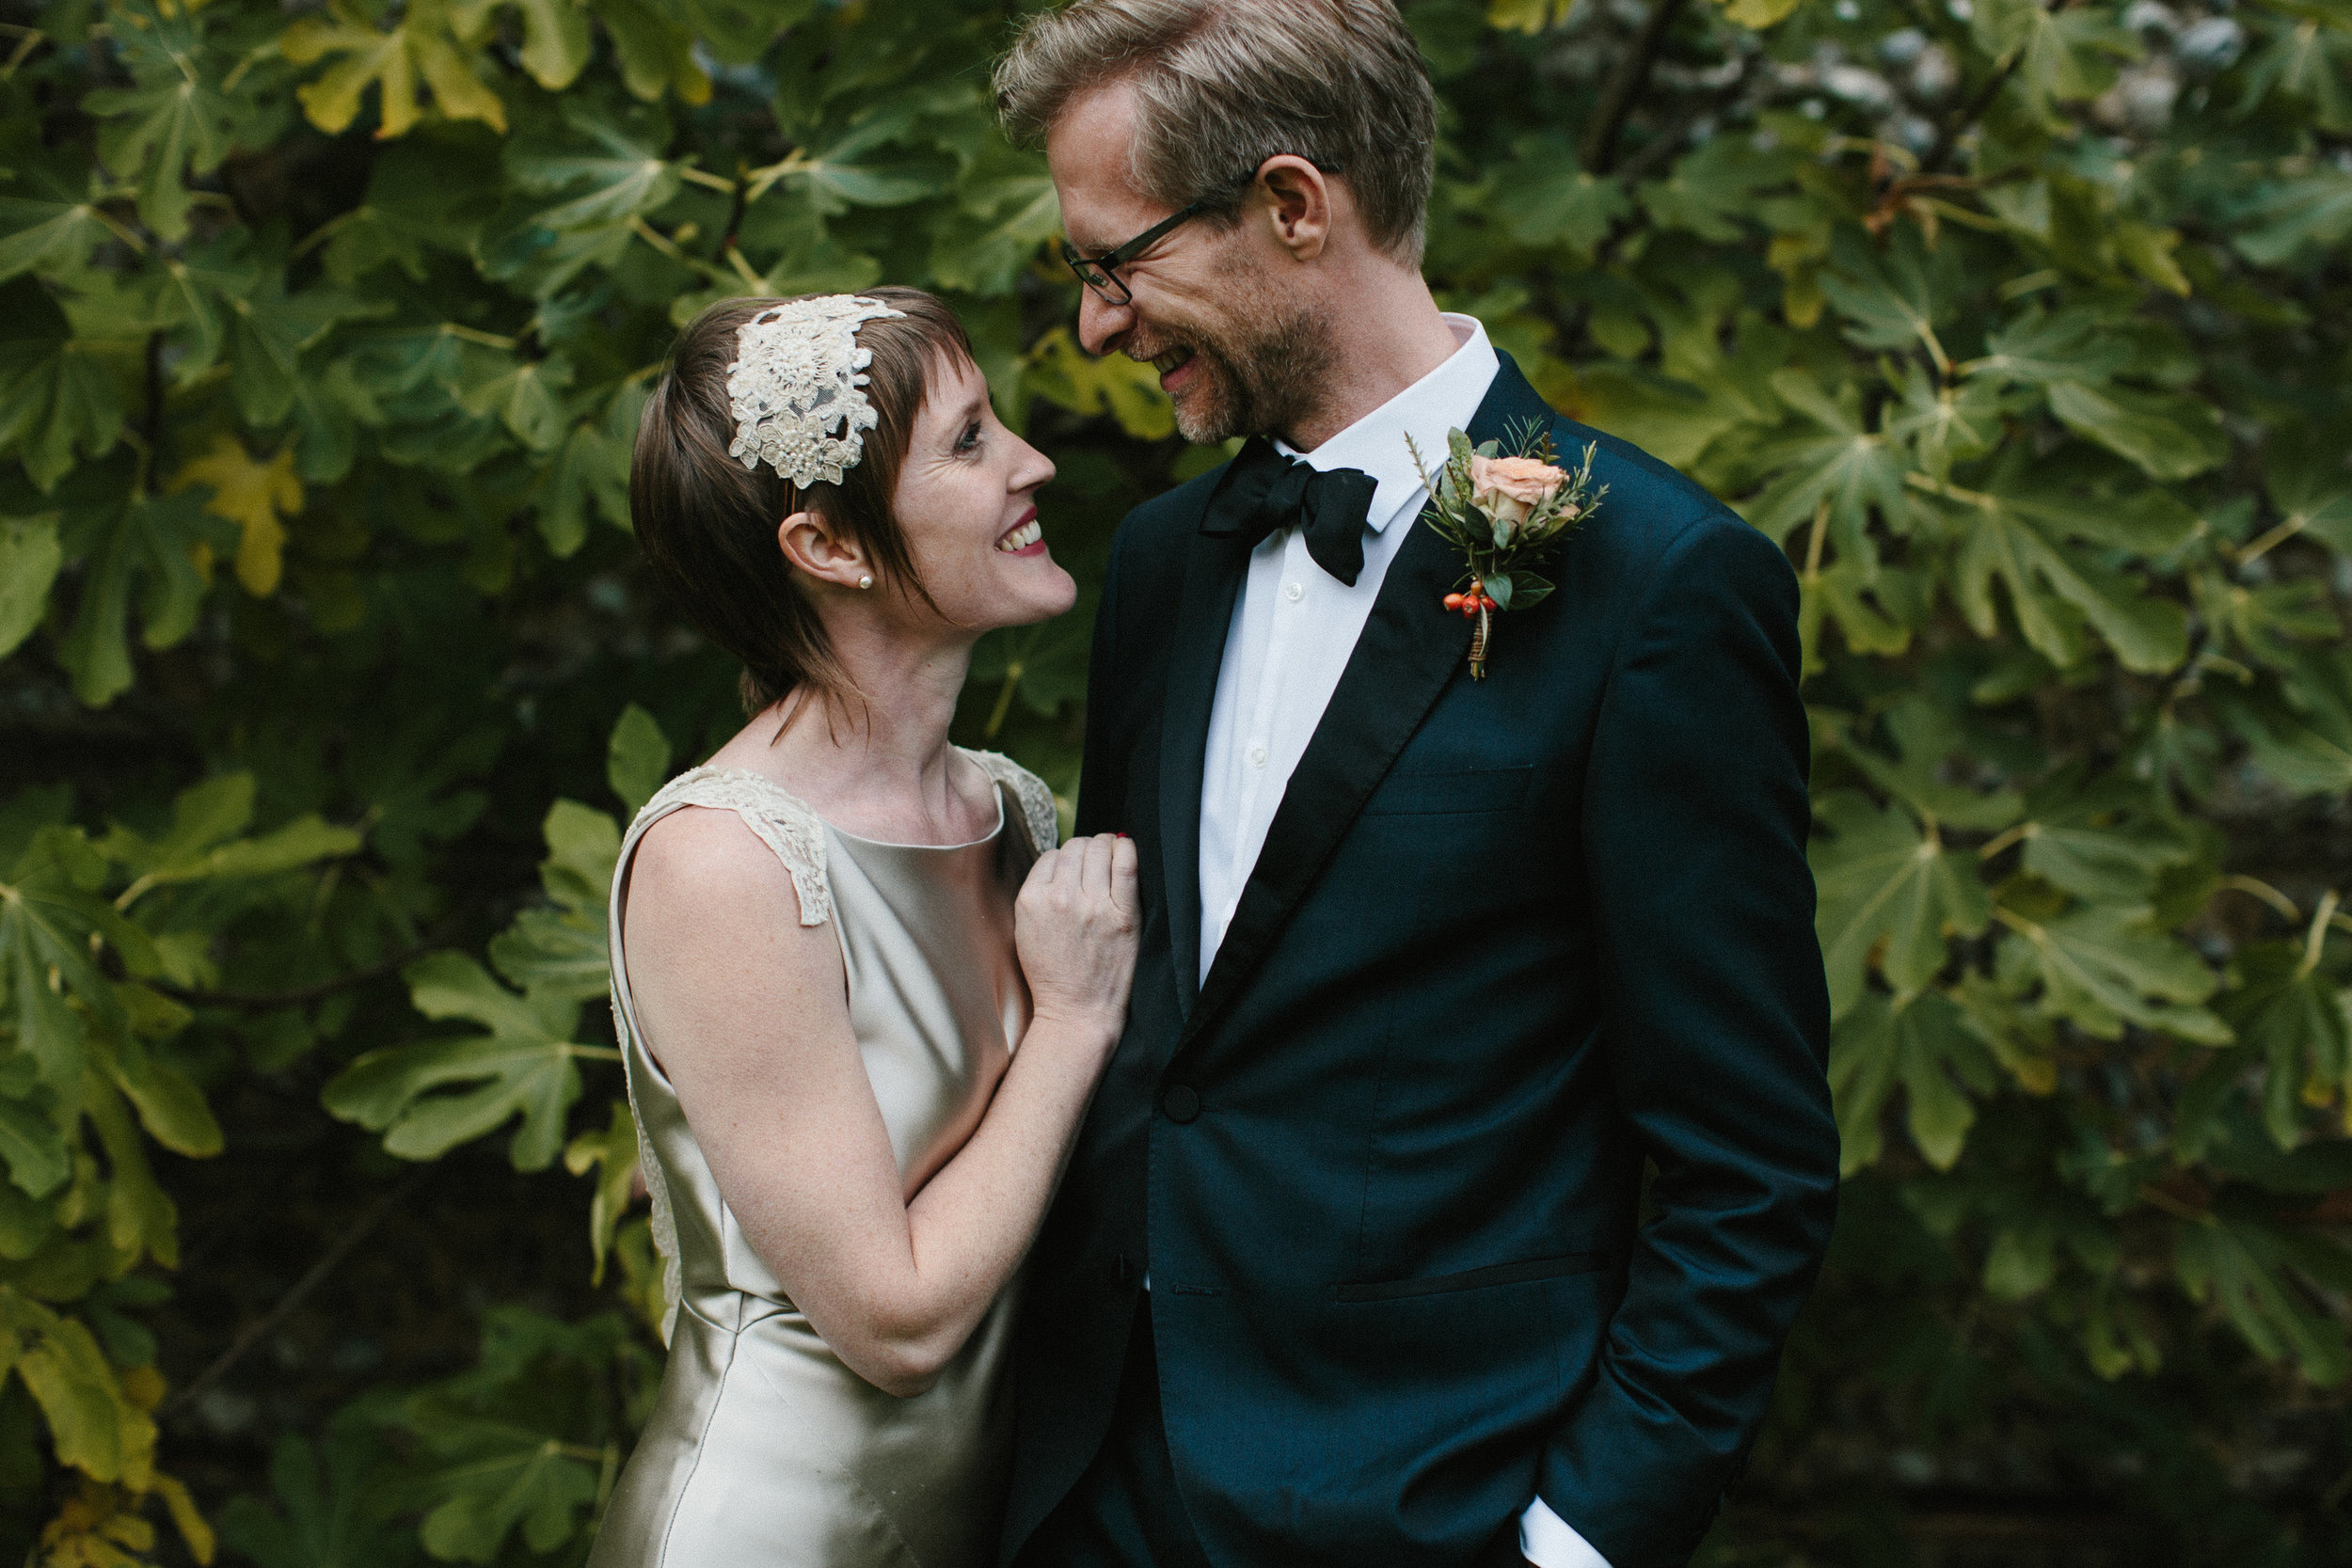 Kate-Beaumont-Sheffield-Honeysuckle-bias-cut-wedding-dress-oyster-Rosie46.jpg